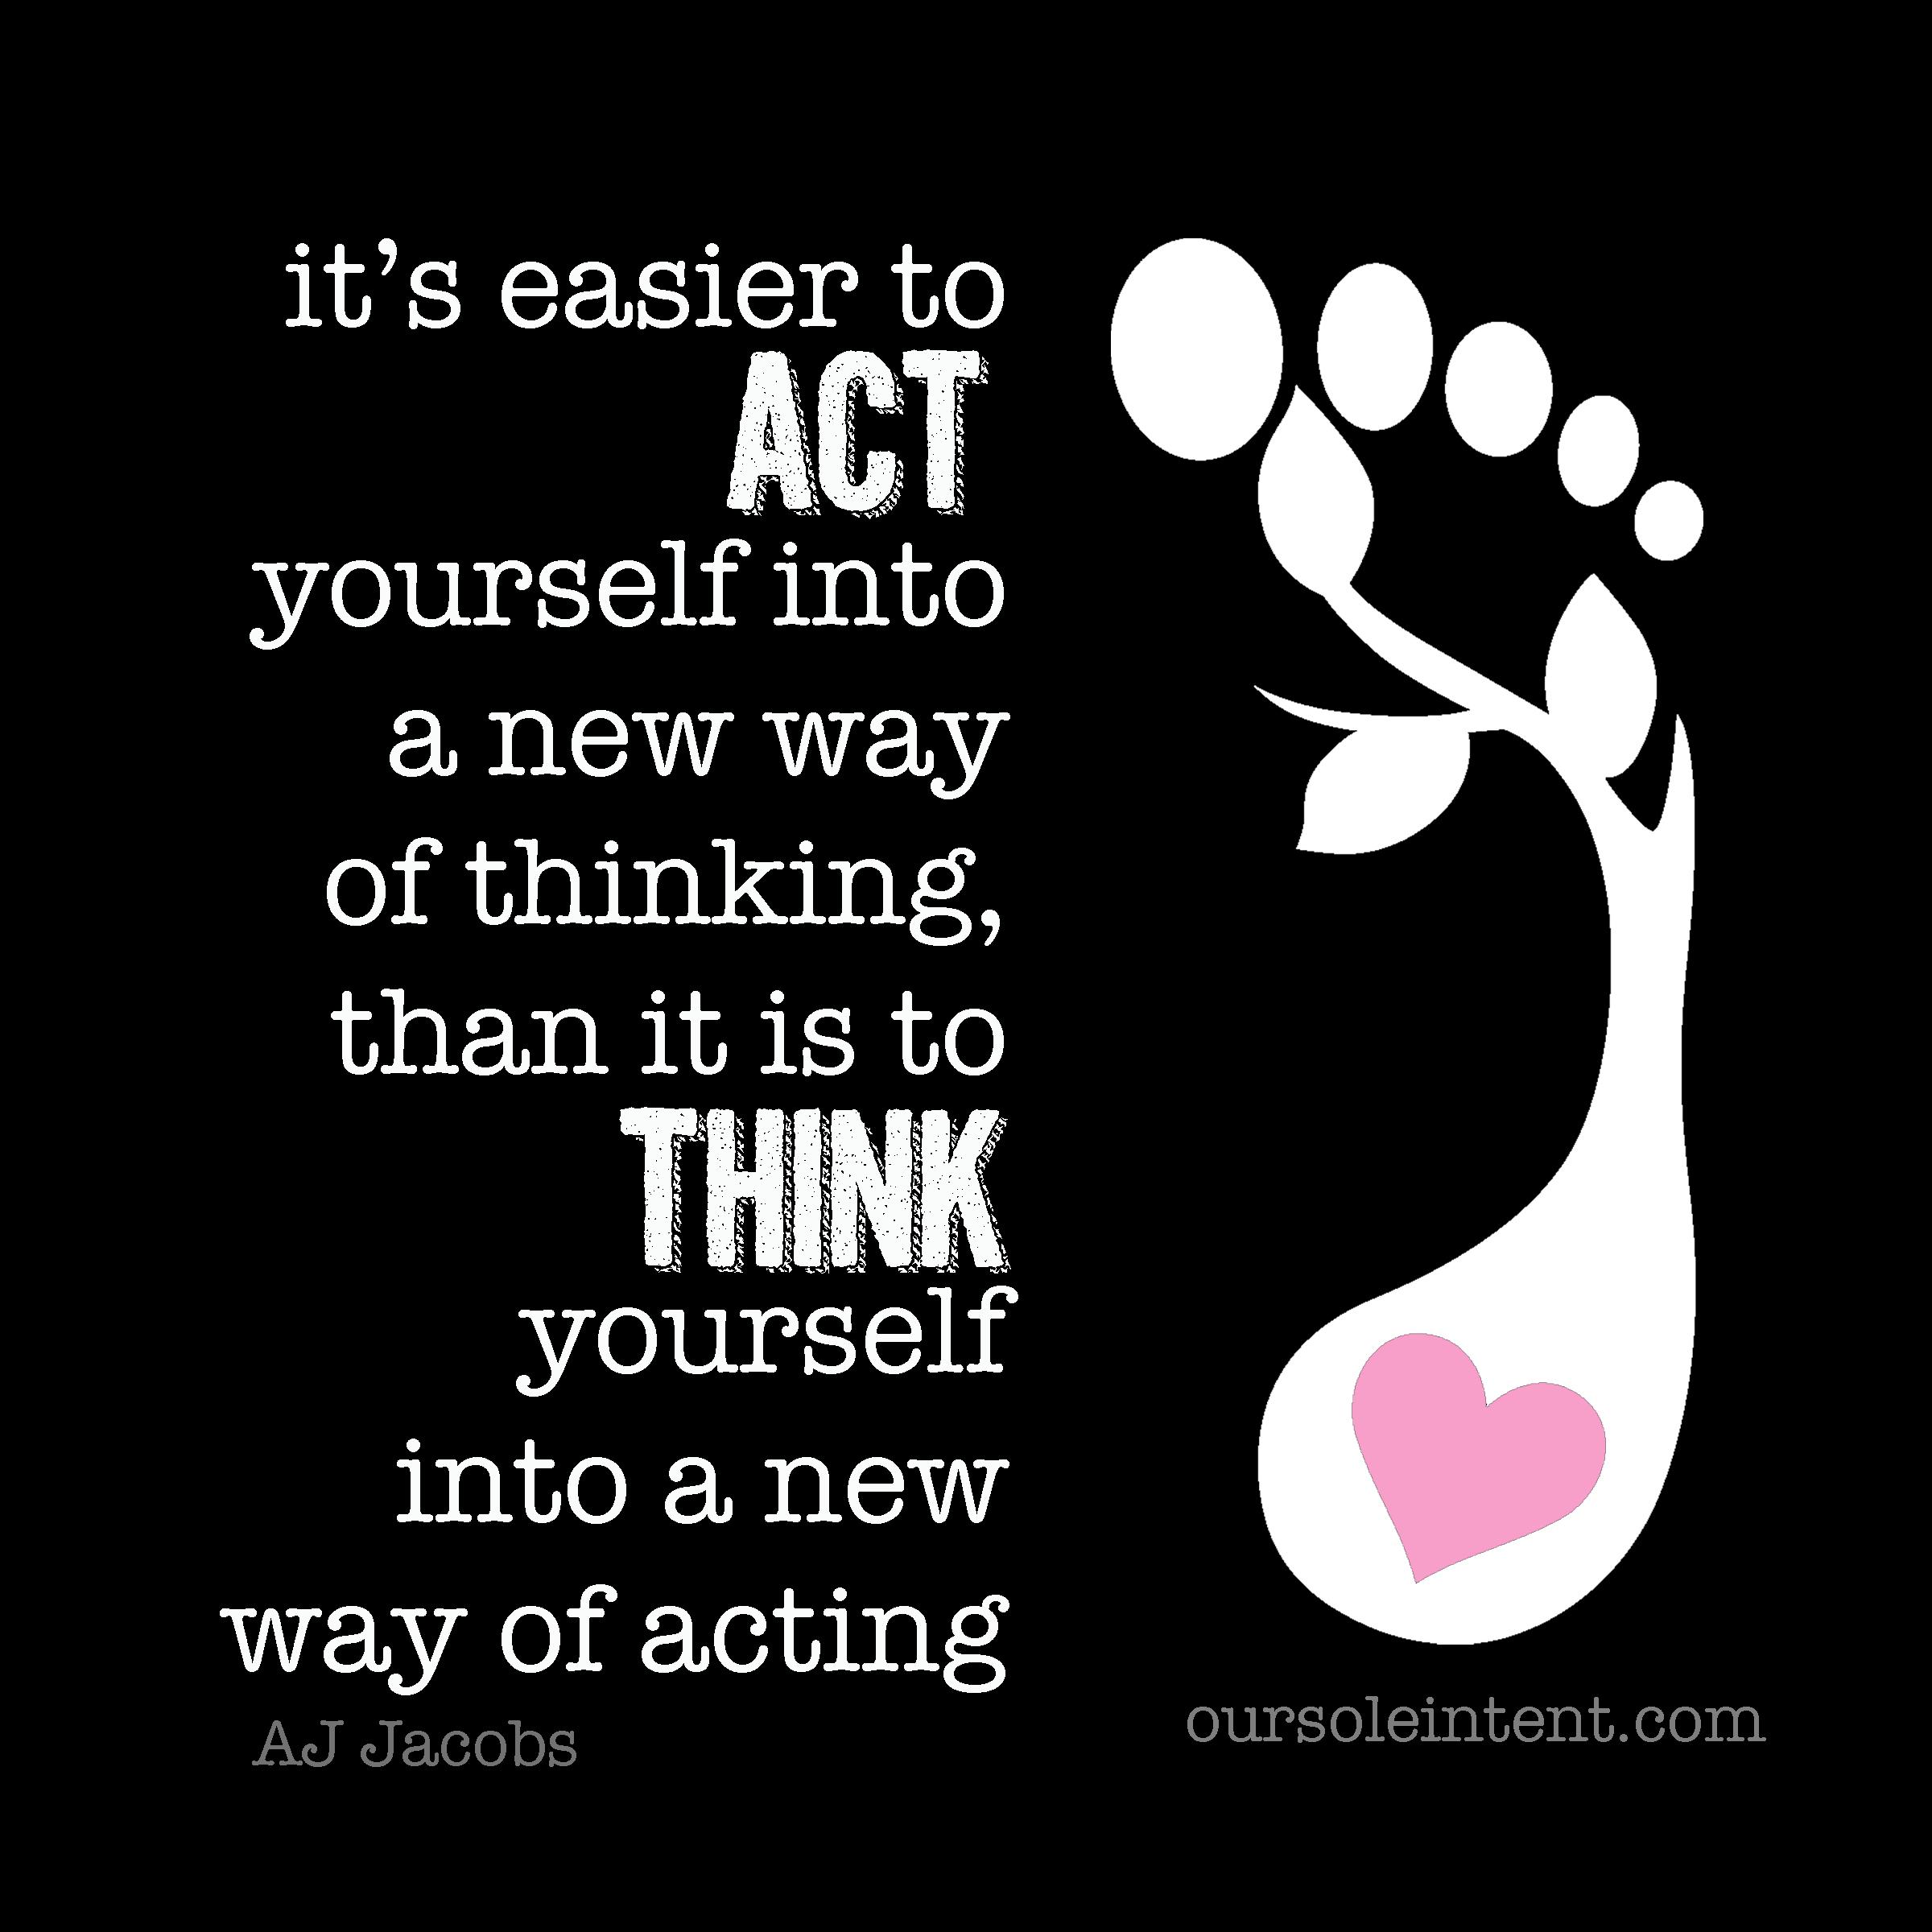 act verse thinking.jpg